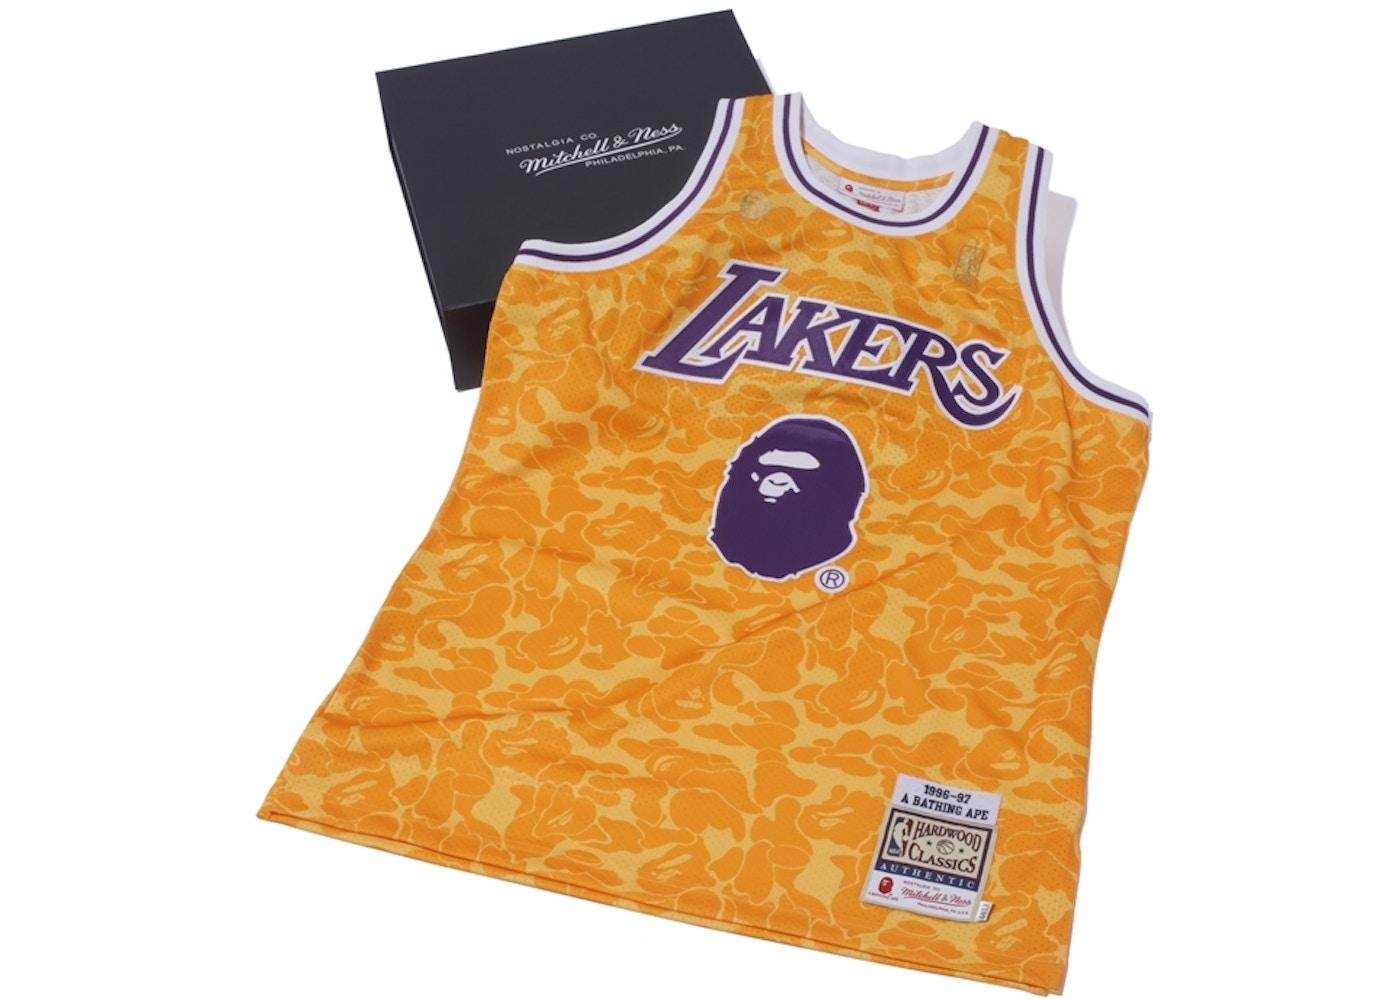 fd05ec45764 Bape x Mitchell & Ness Lakers ABC Basketball Authentic Jersey Yellow